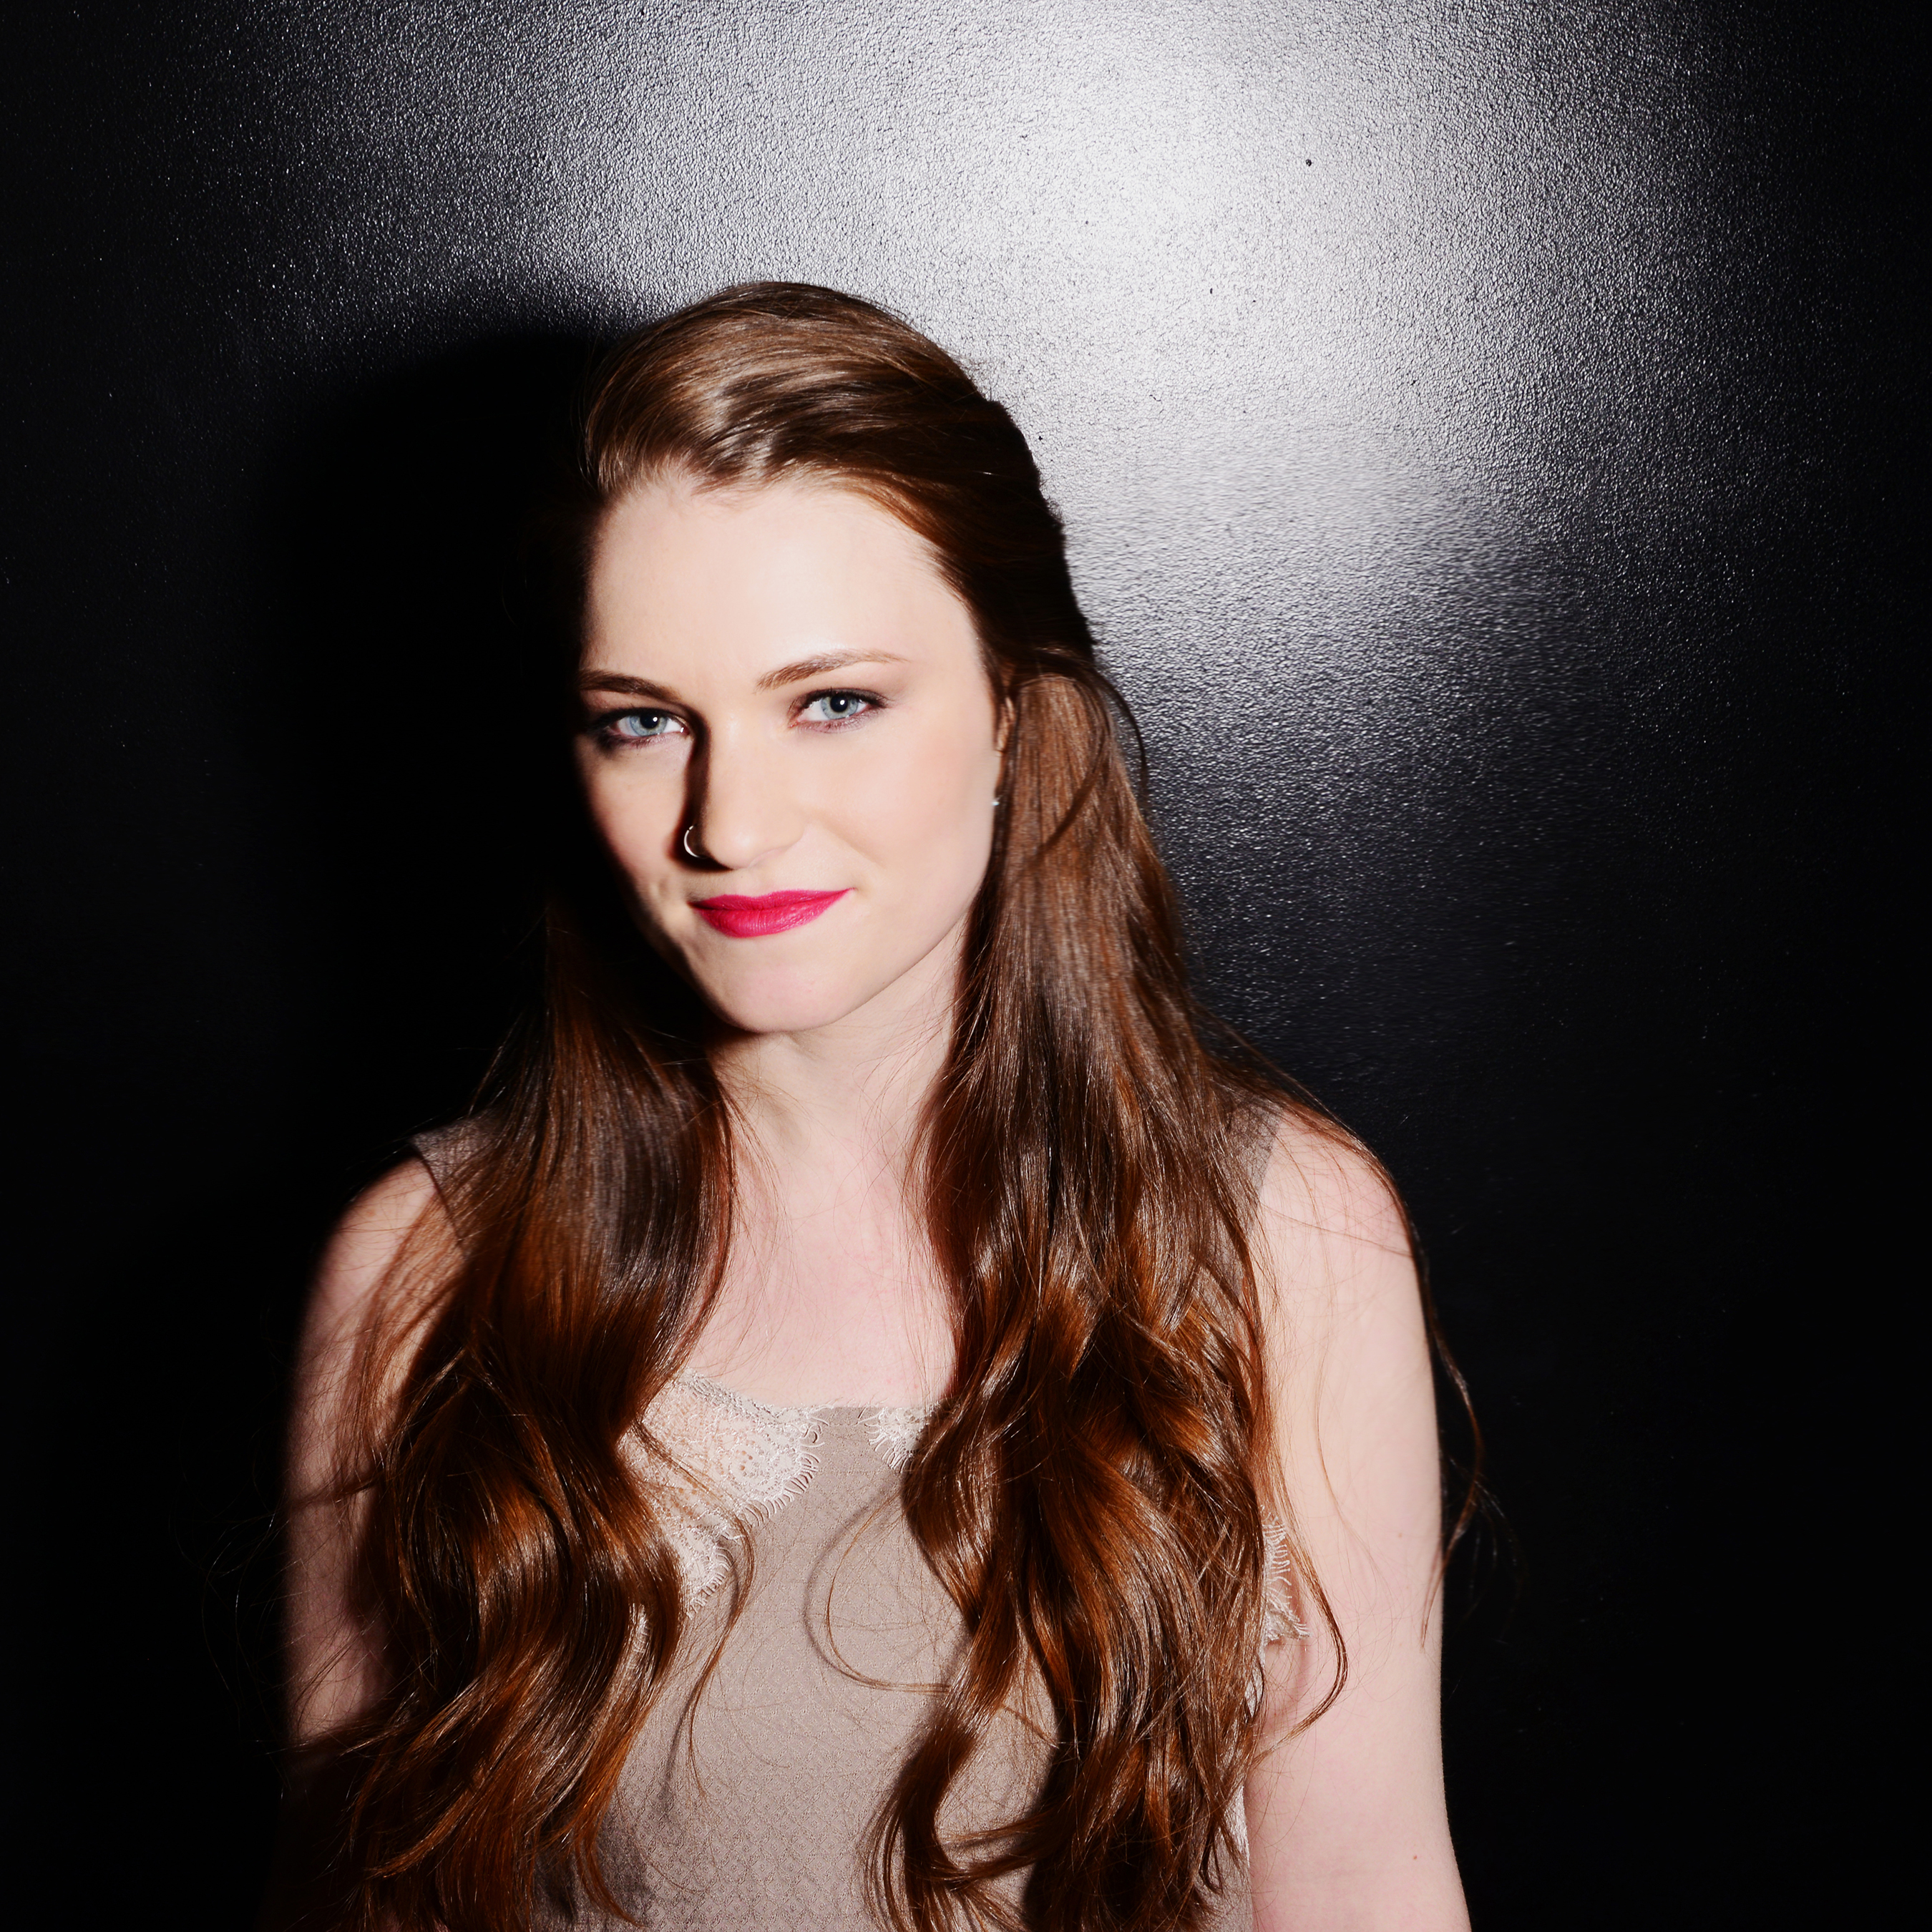 Caili O'doherty - Promo Photo 3